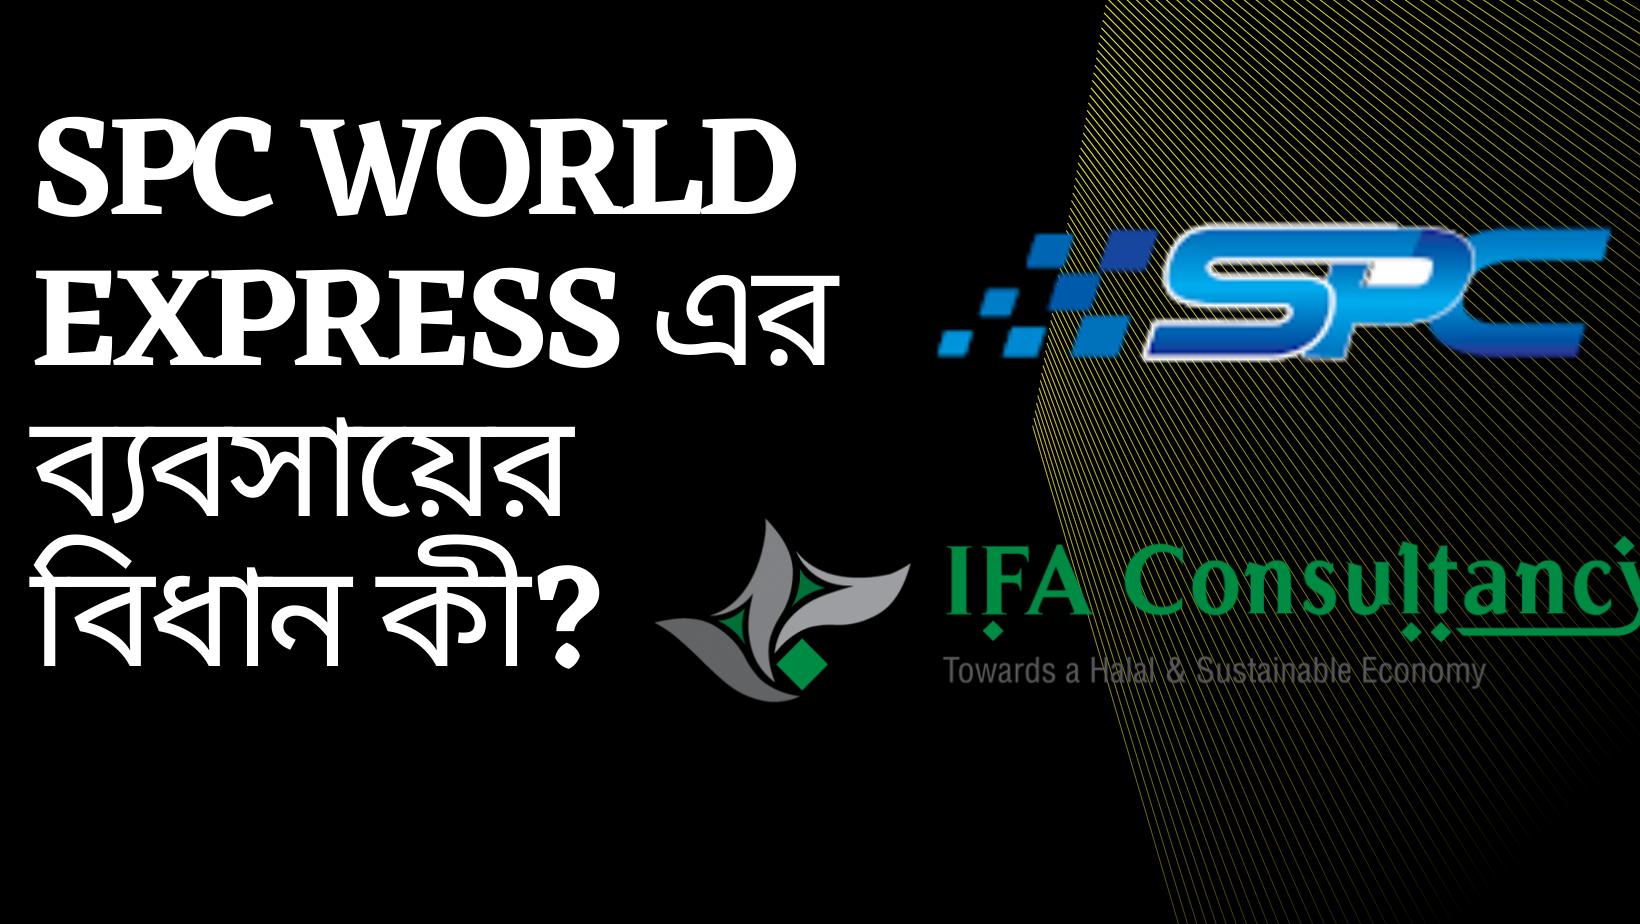 SPC World Express এর ব্যবসায়ের বিধান কী?